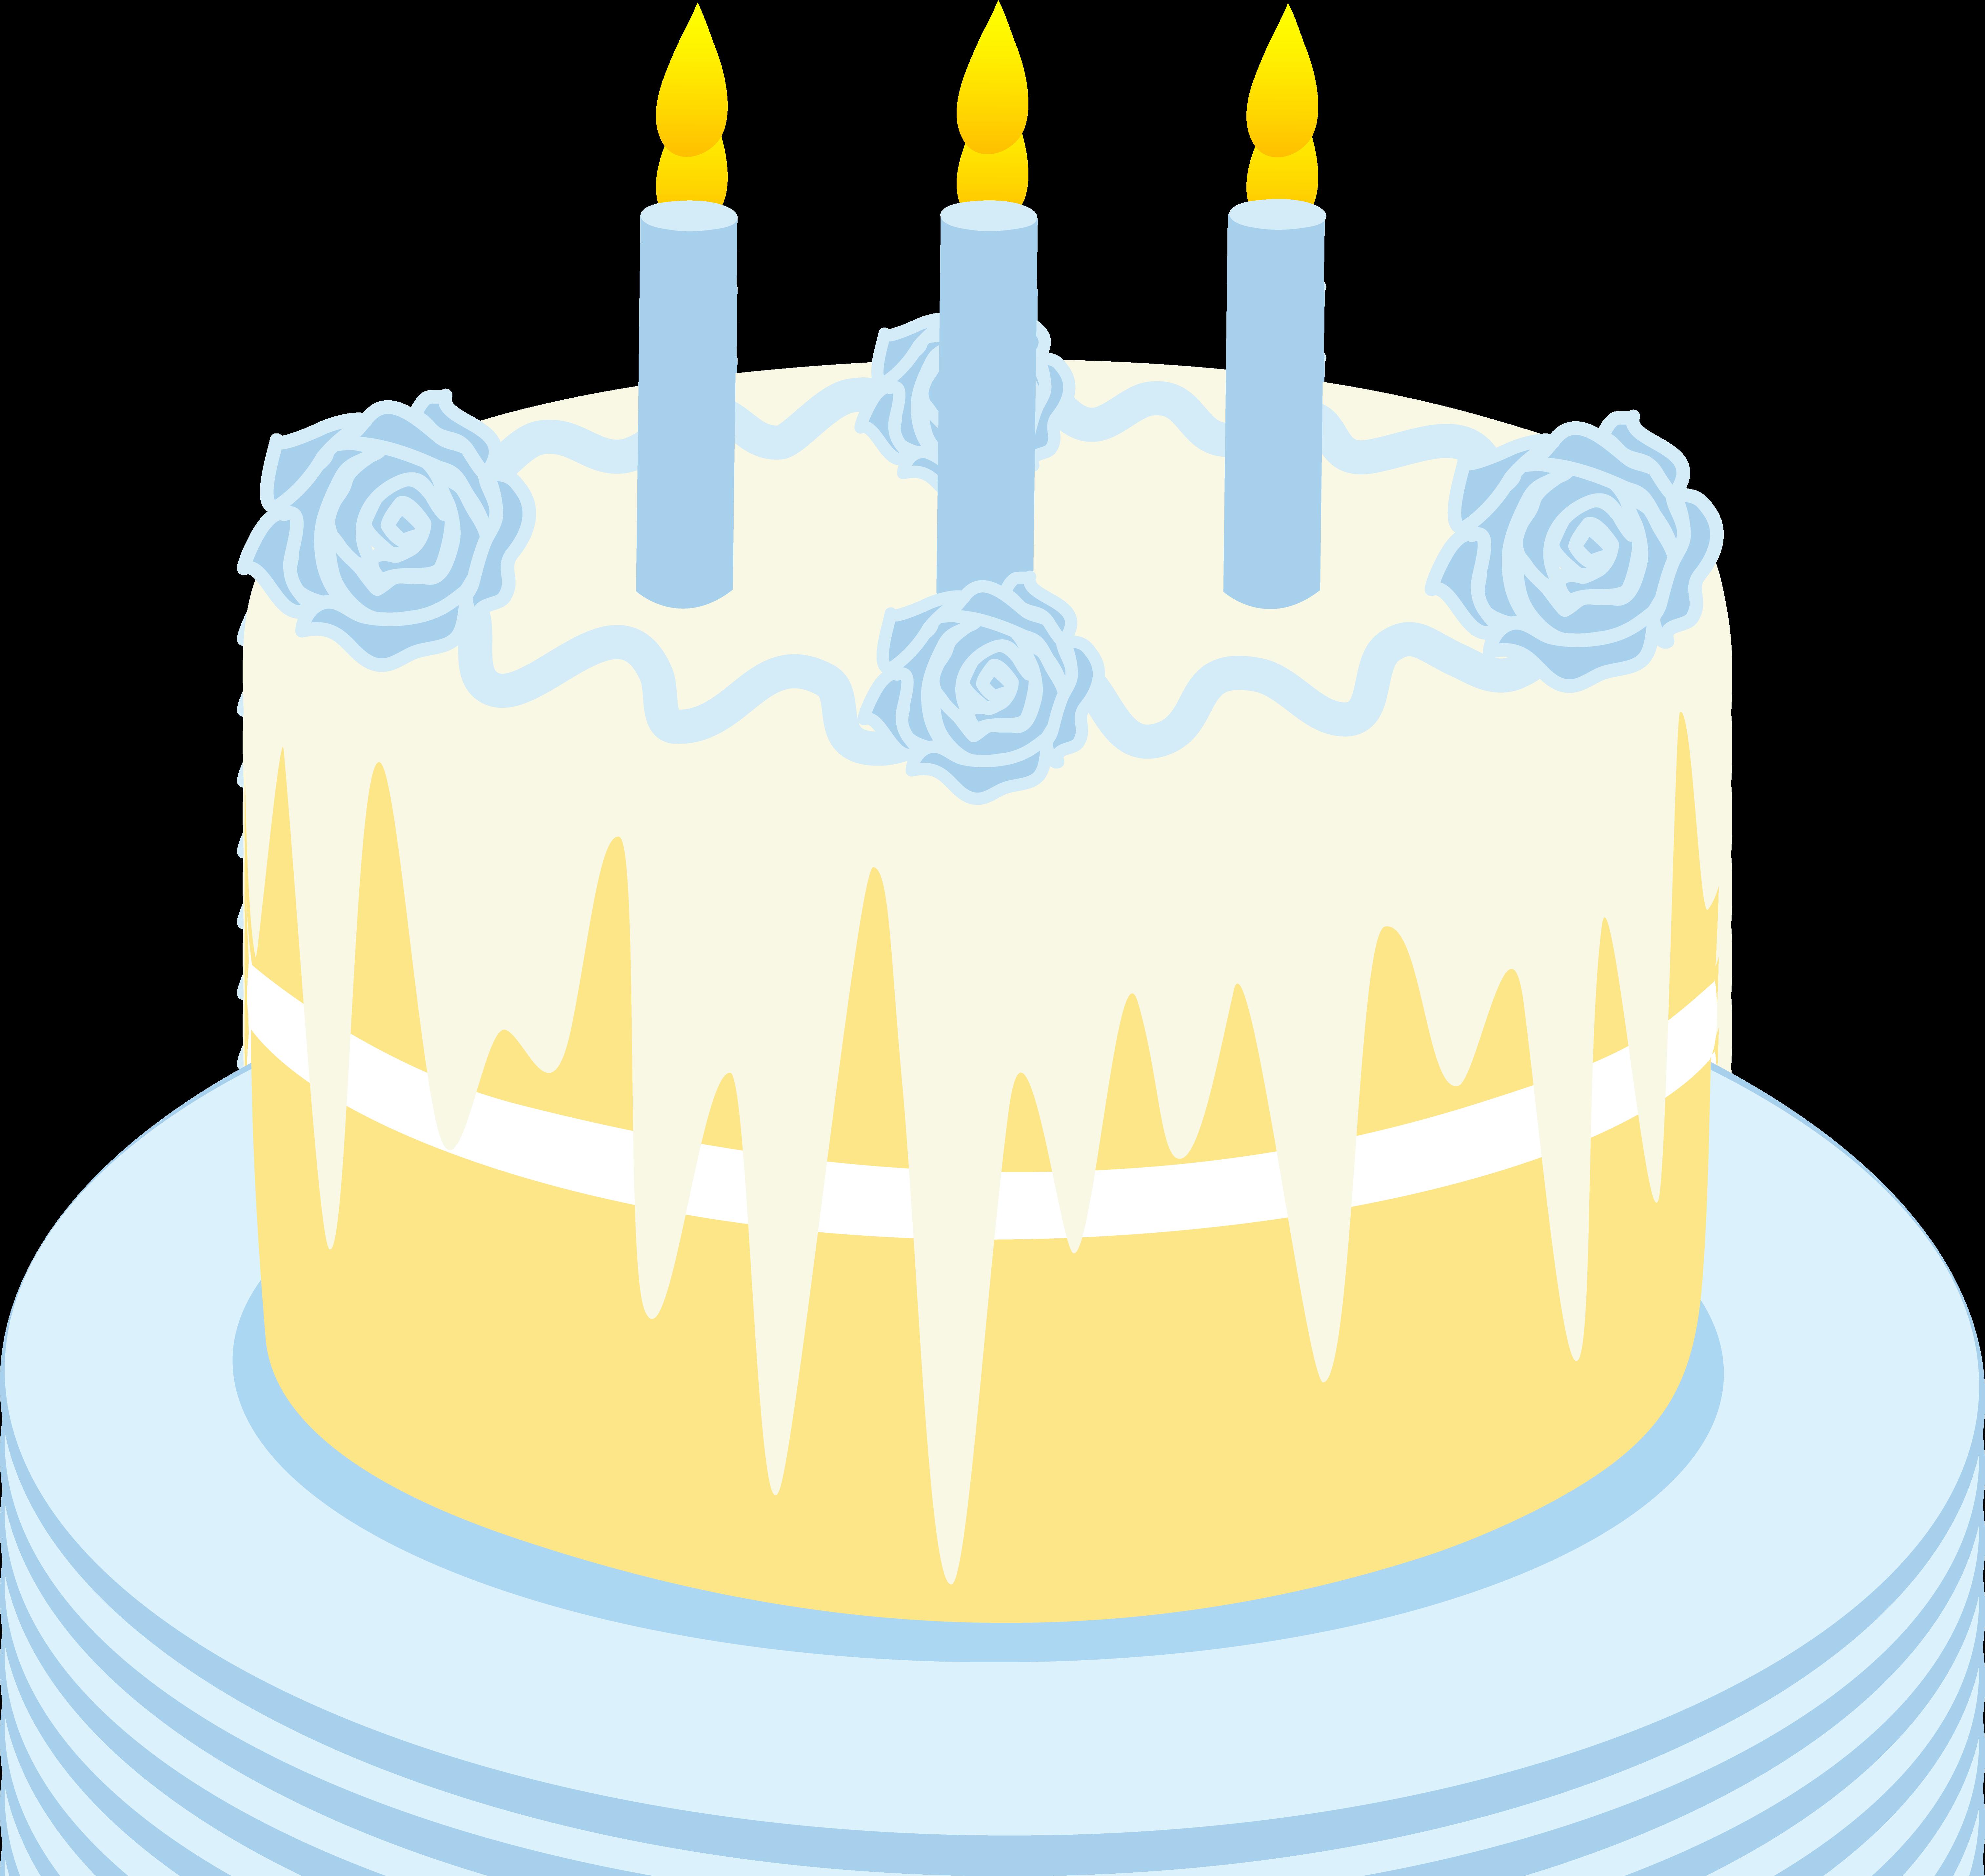 Desserts clipart baked goods. Vanilla birthday cake clip